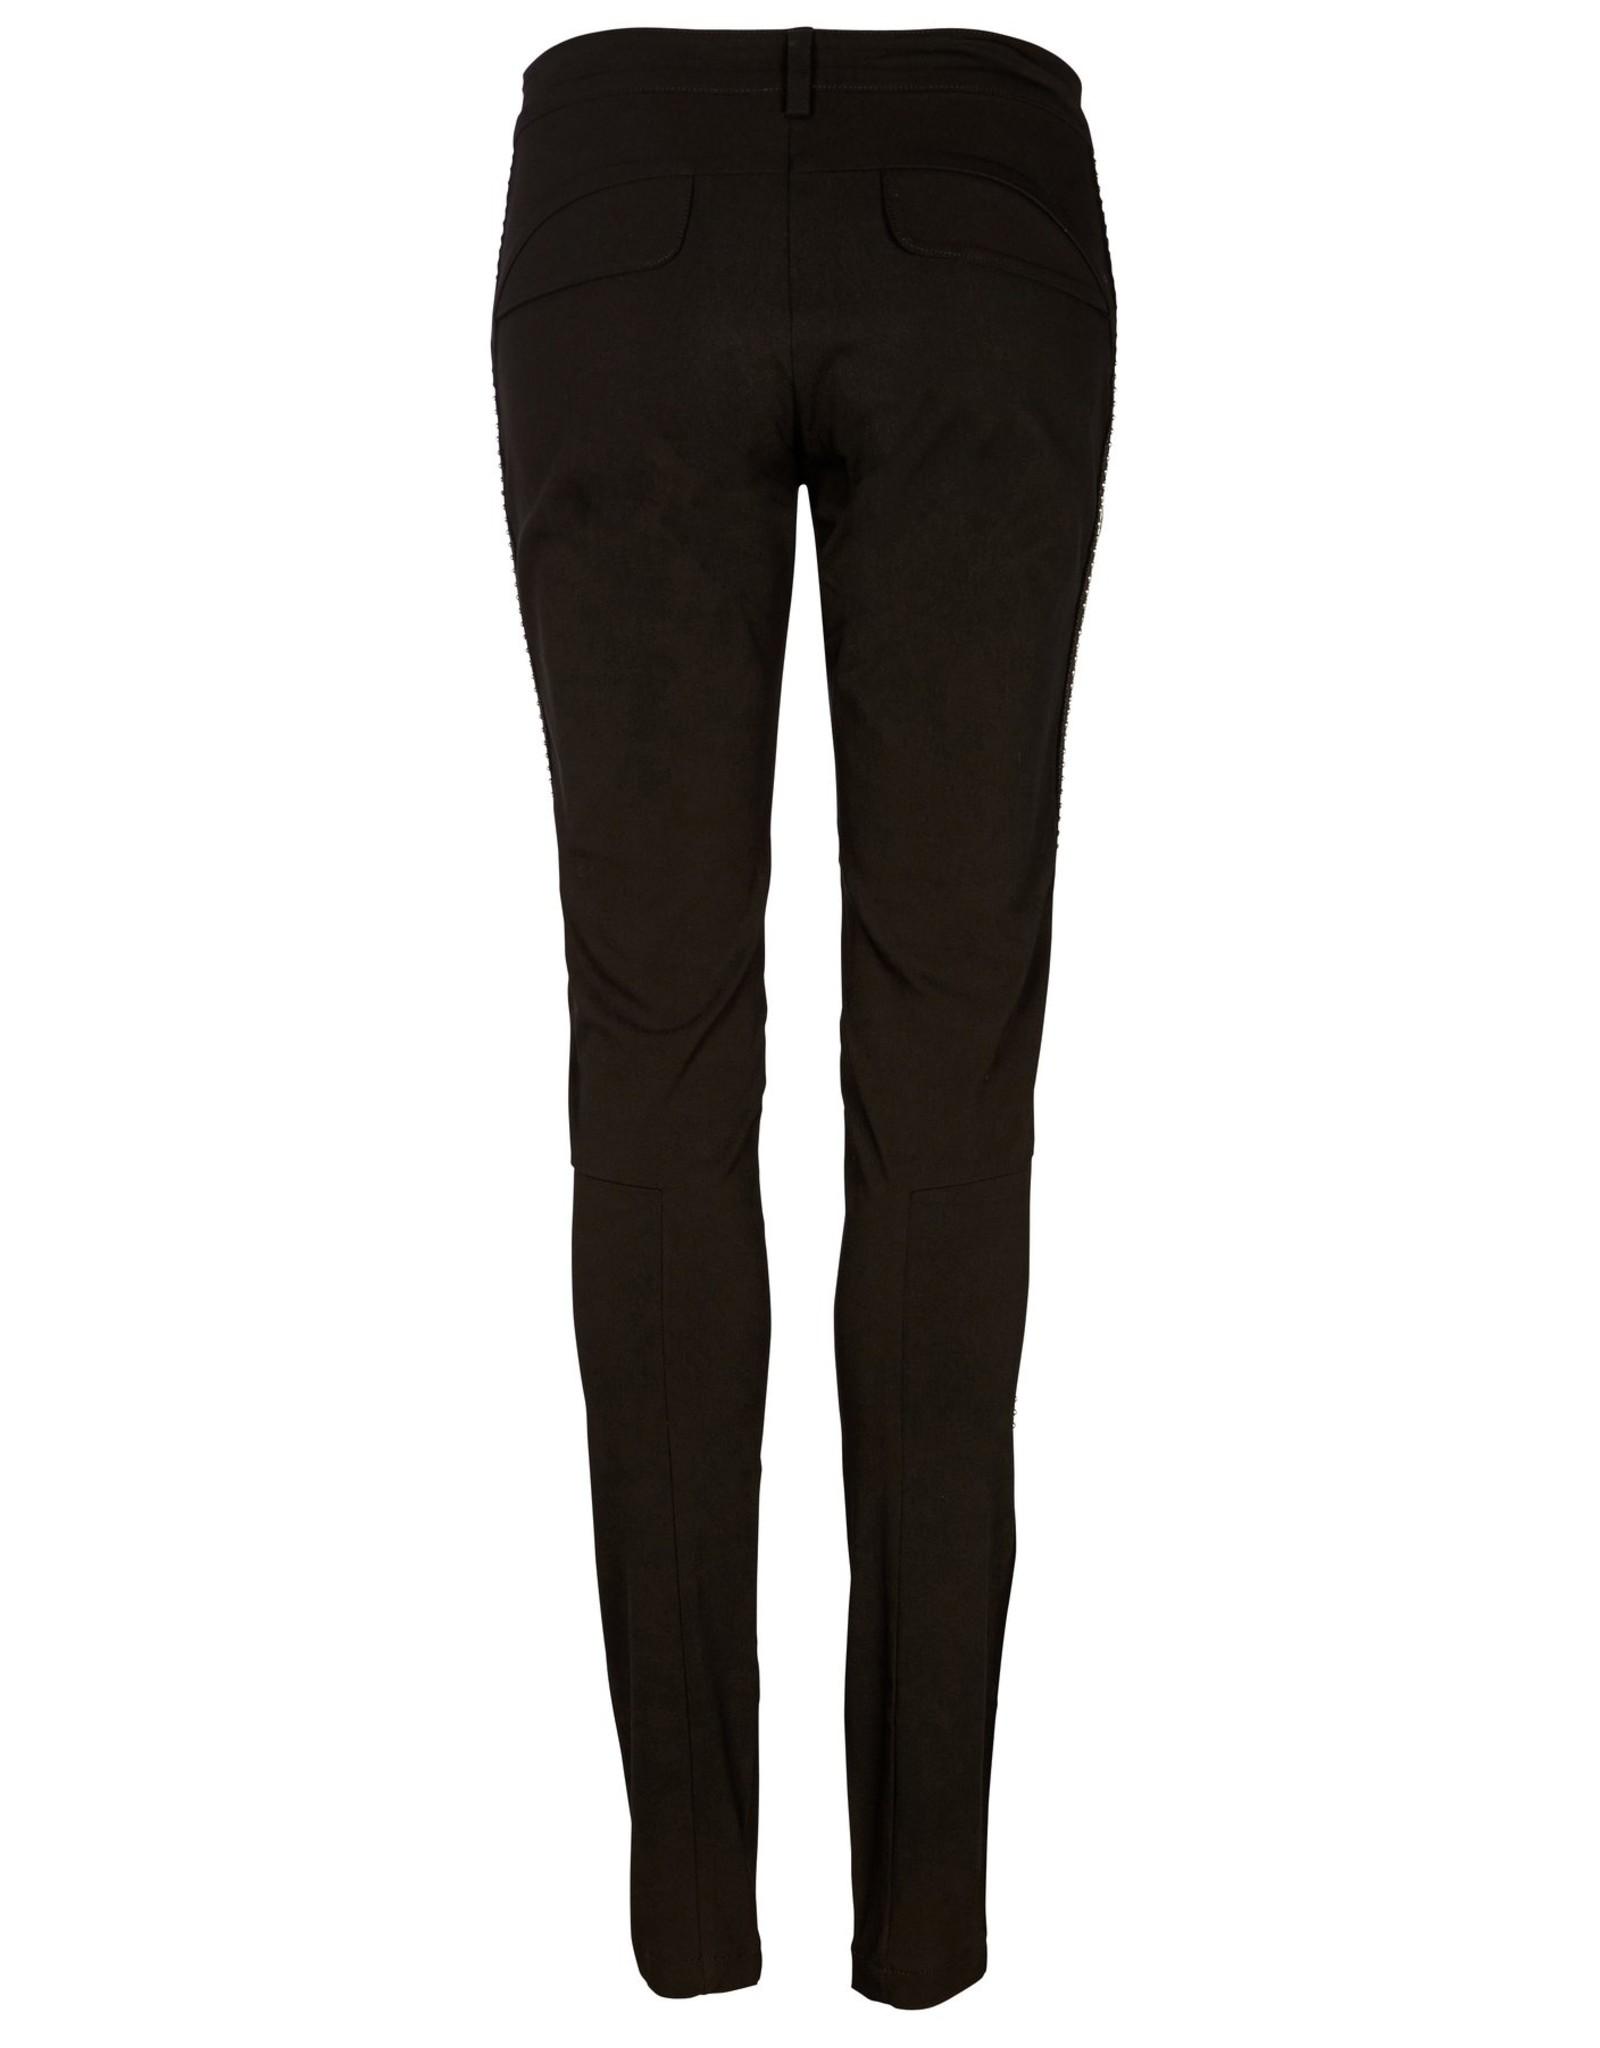 Nu Denmark Raix Eli Black Trousers